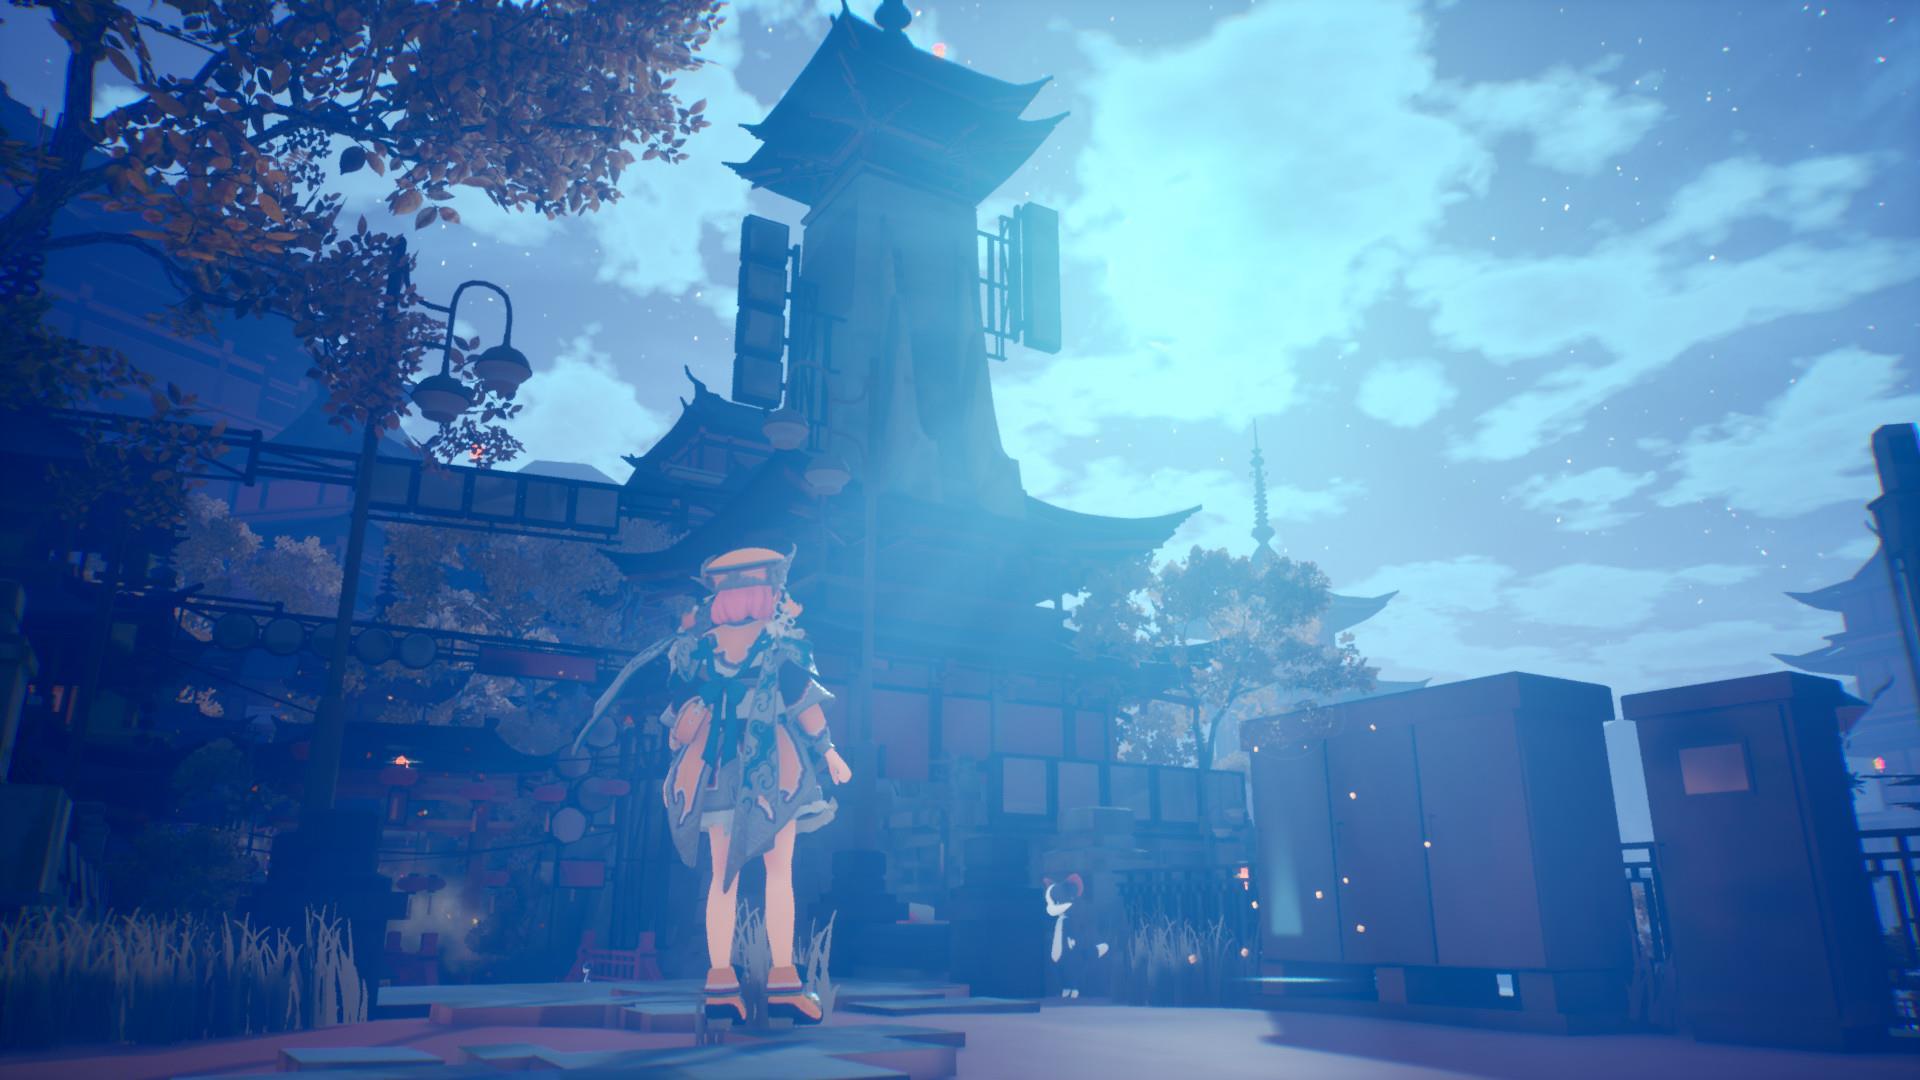 Tasomachi: Behind the Twilight